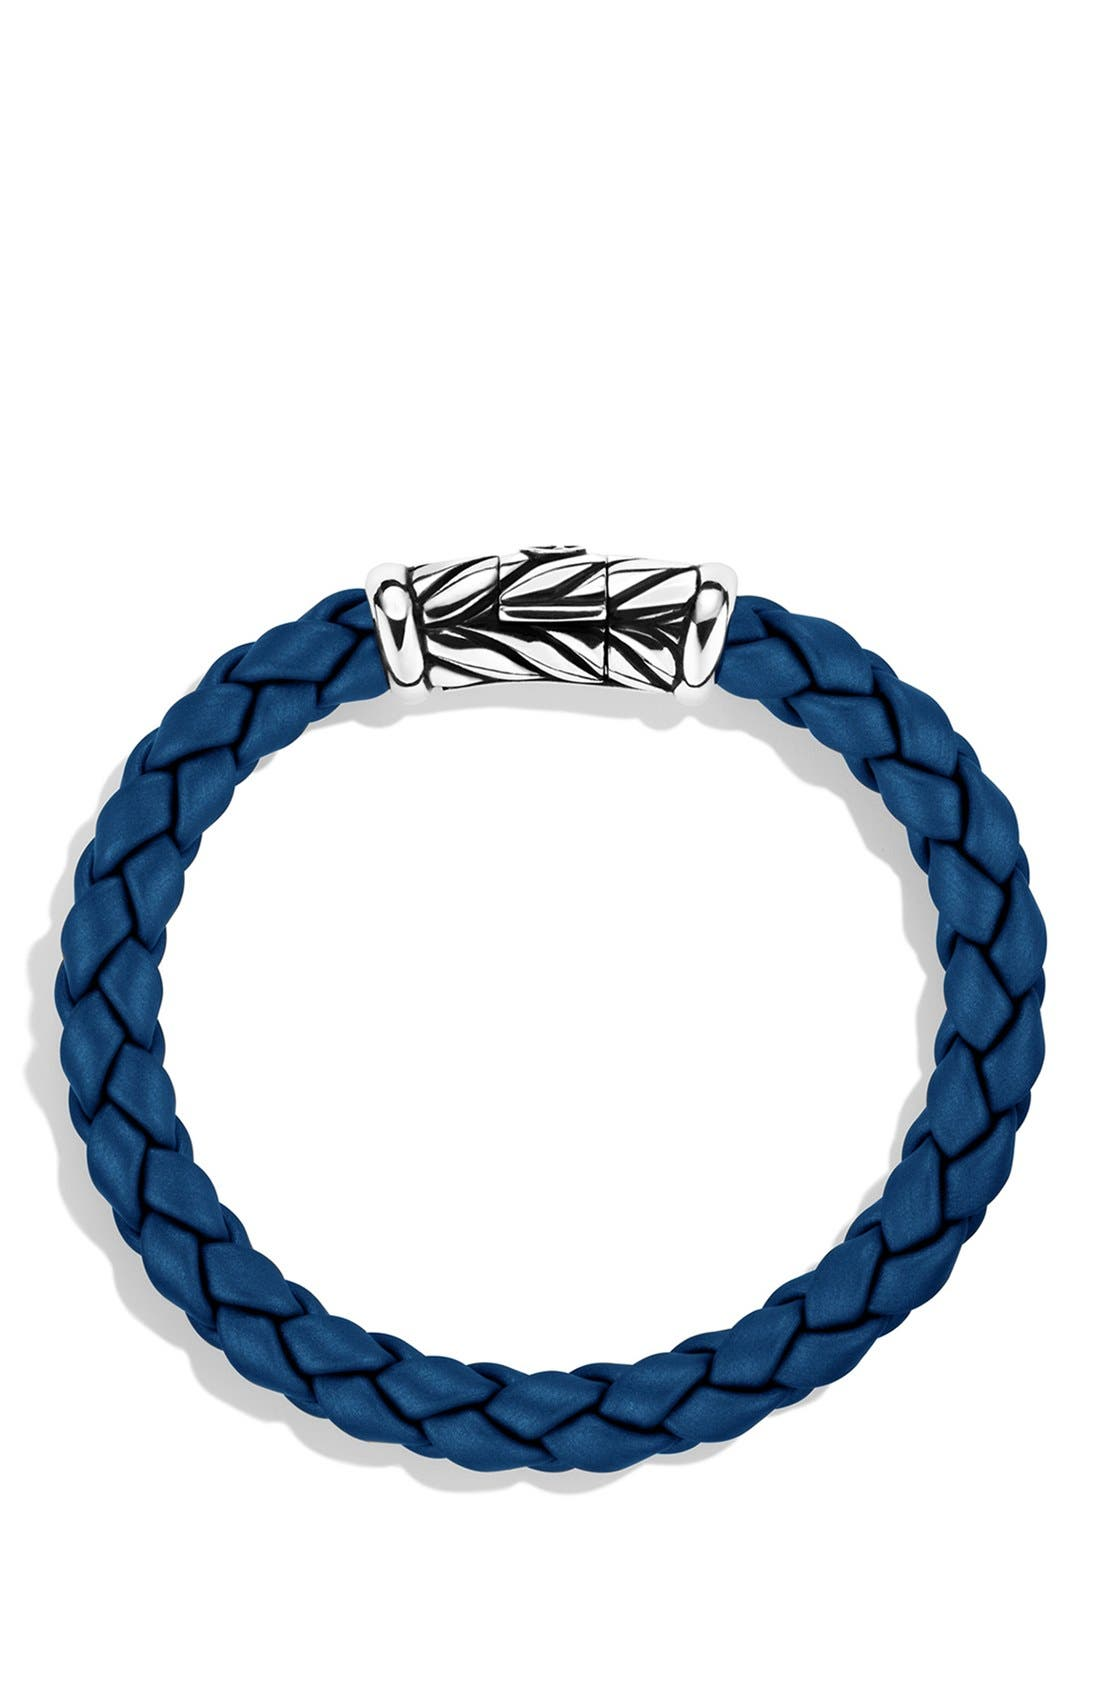 DAVID YURMAN, 'Chevron' Bracelet, Alternate thumbnail 2, color, BLUE